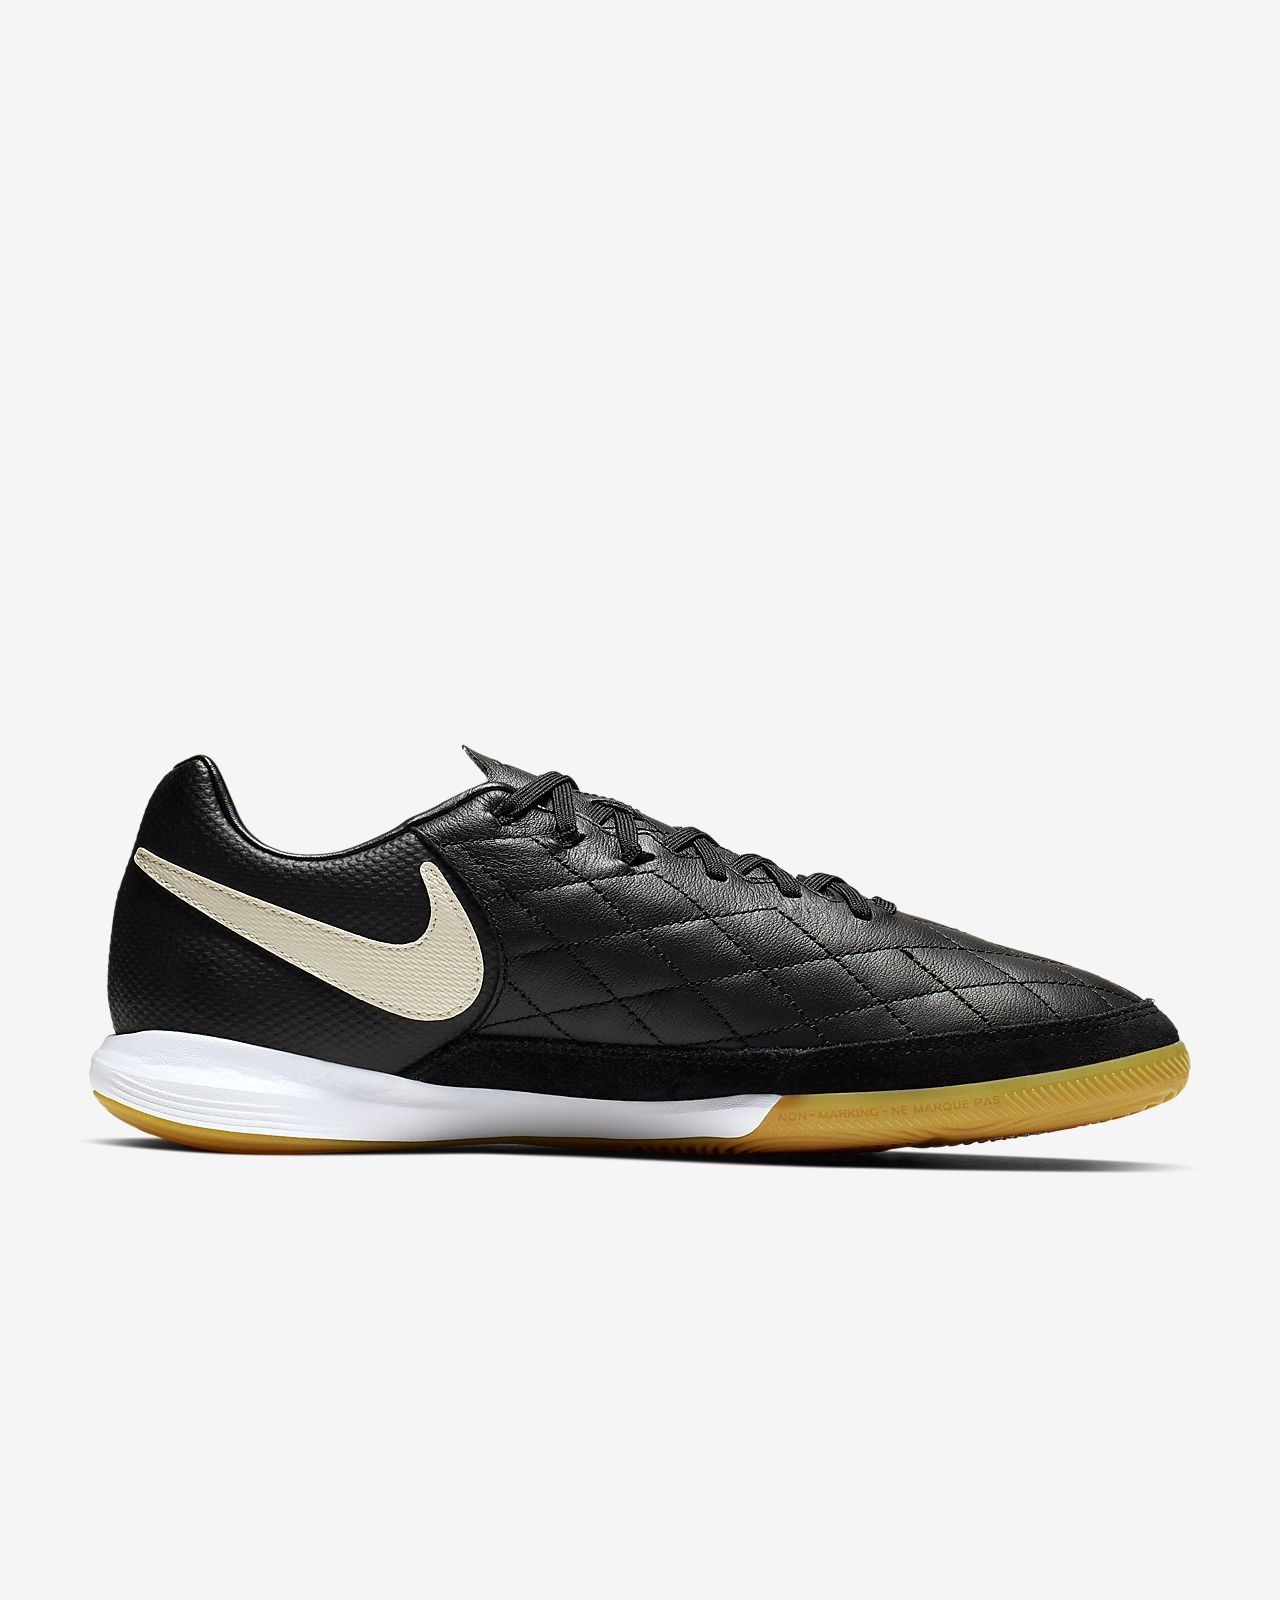 9703952275d Nike TiempoX Lunar Legend VII Pro 10R Botas de fútbol sala. Nike.com ES